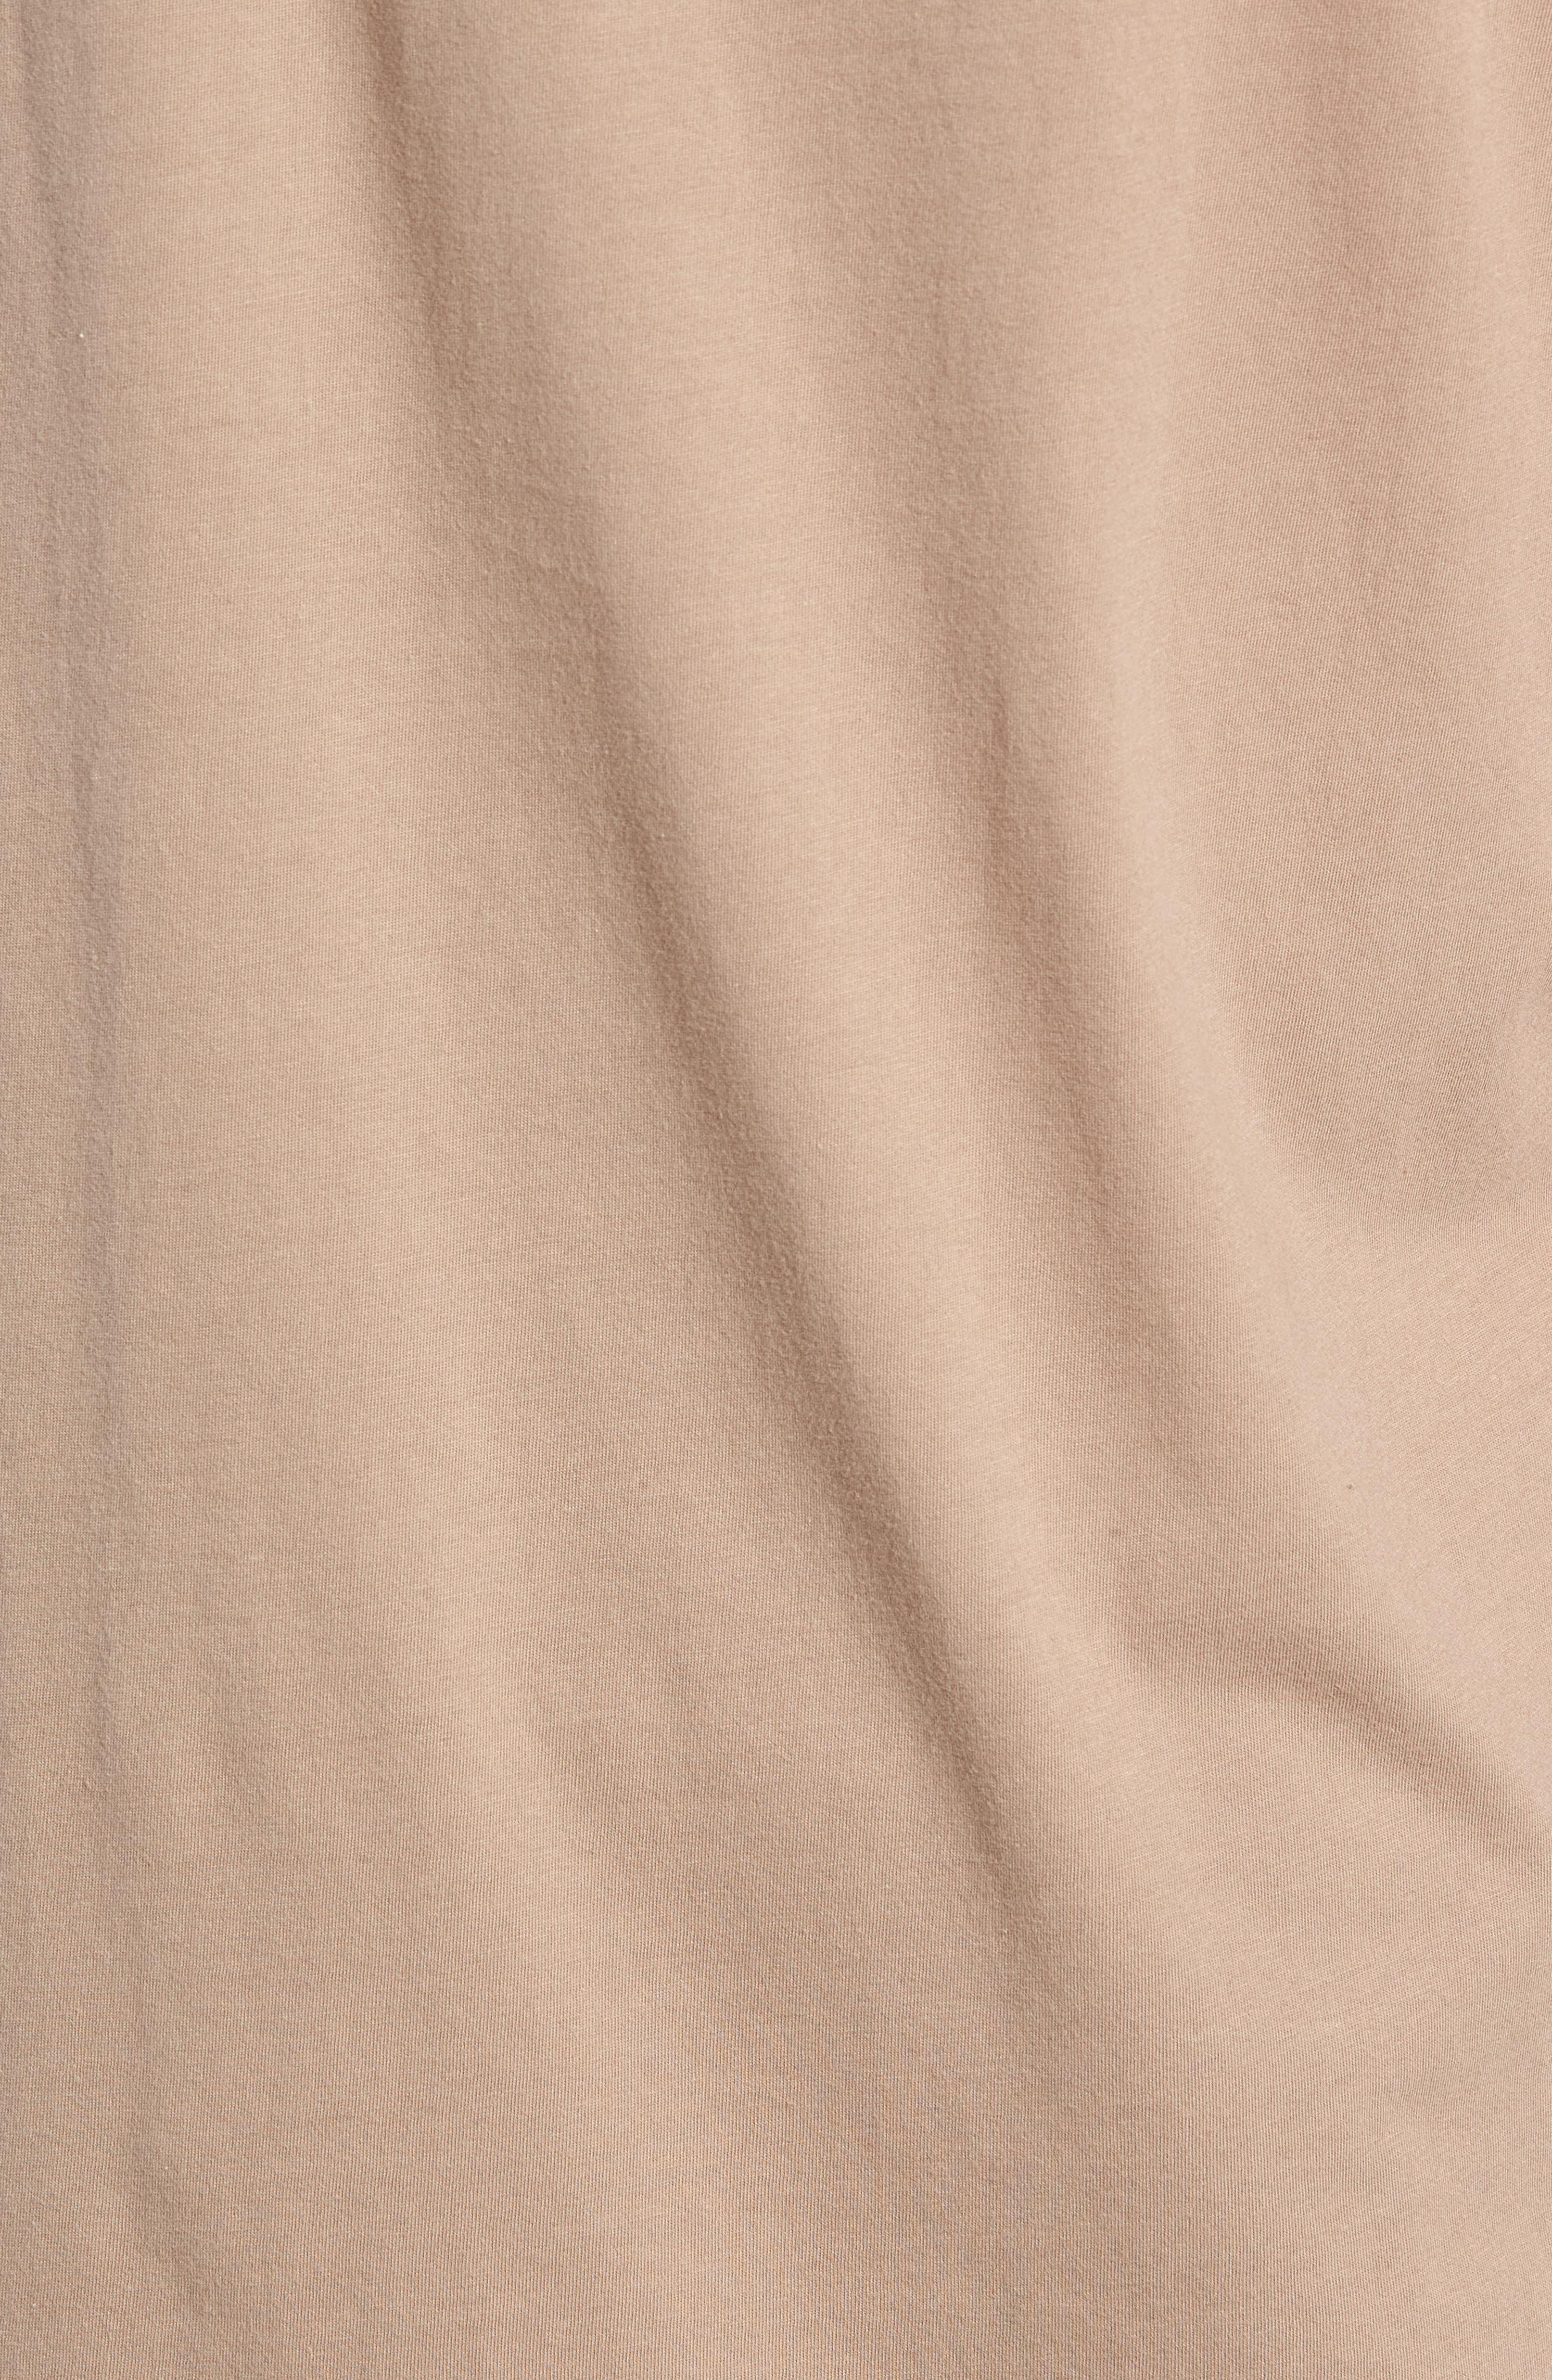 Flintlock T-Shirt,                             Alternate thumbnail 5, color,                             TIMBER